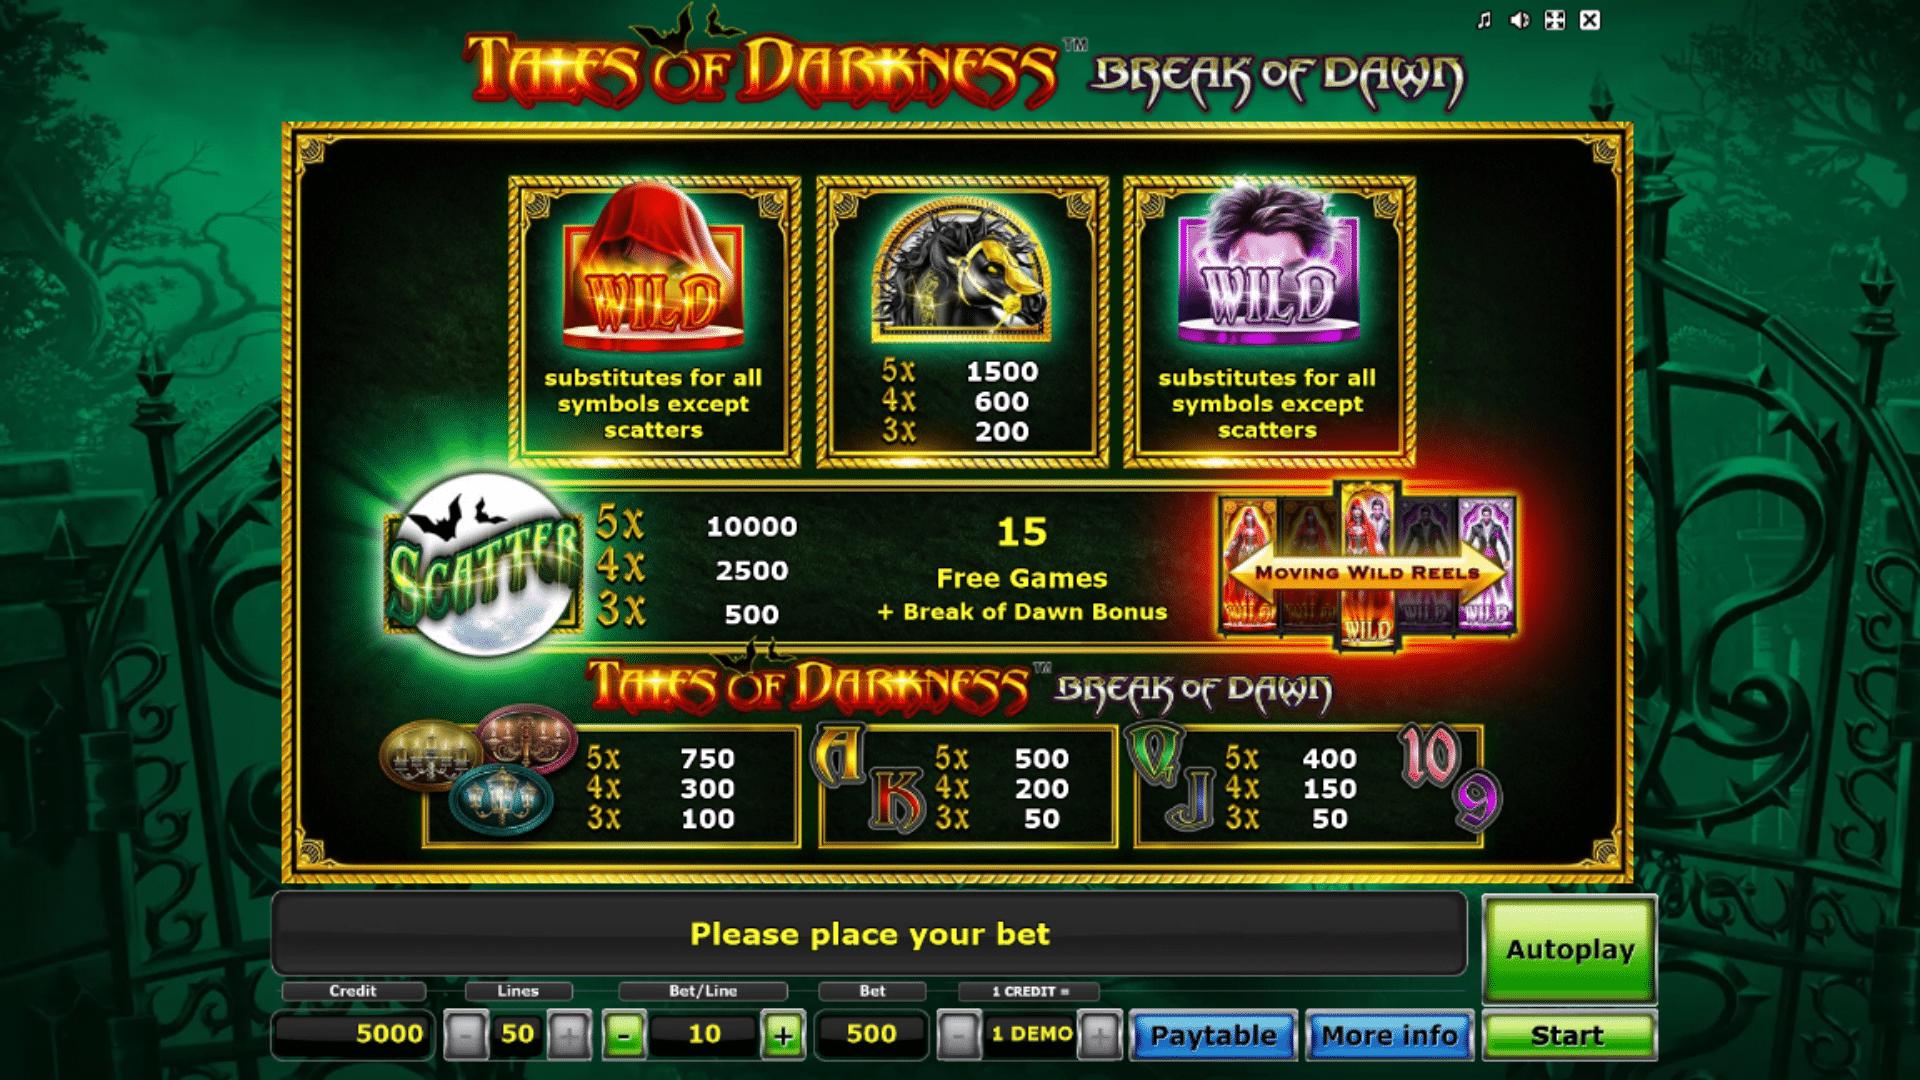 Paytable della Slot Gratis Tales of Darkness Break of Dawn